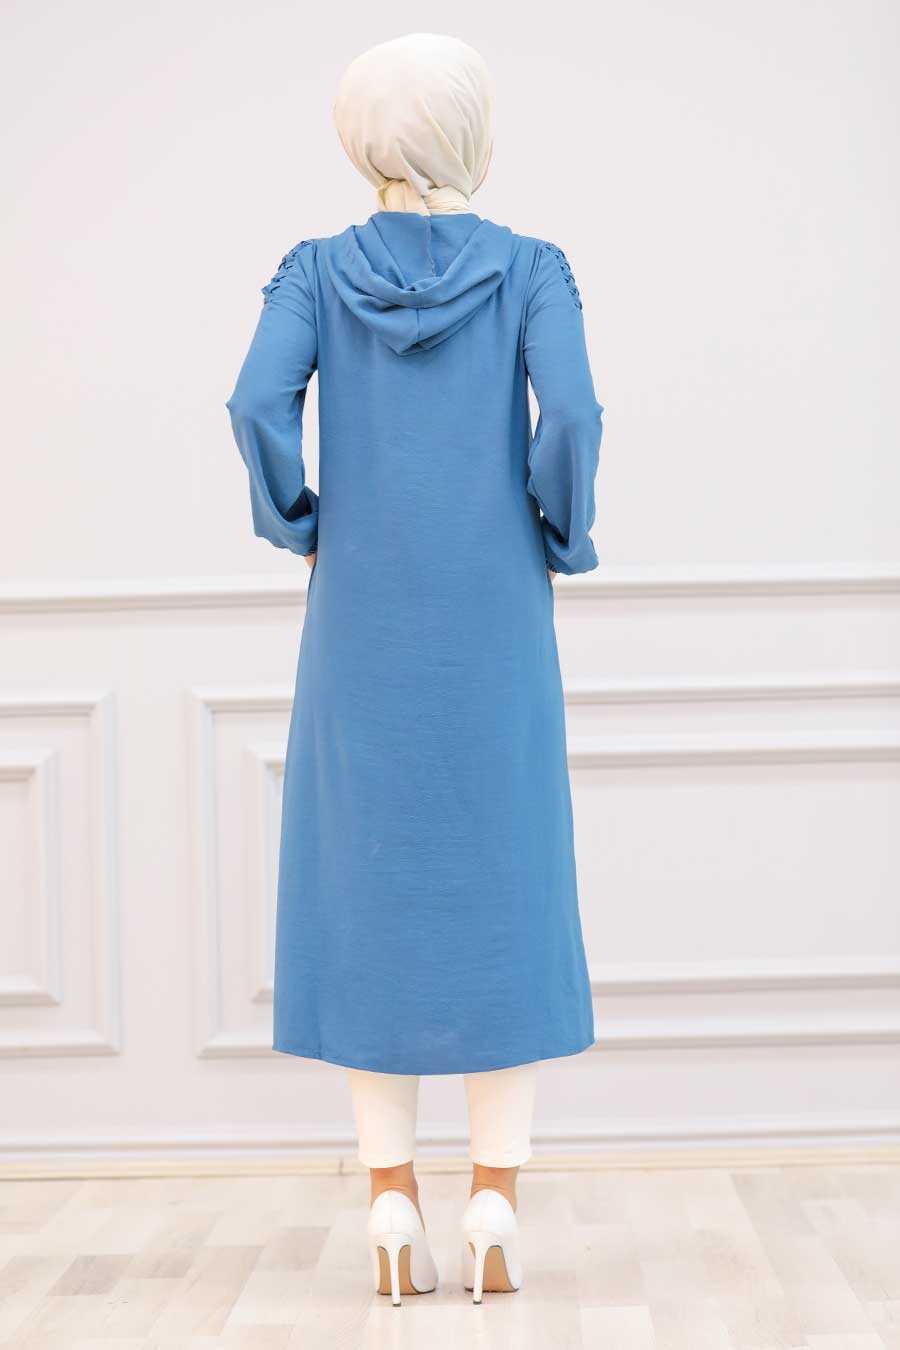 İndigo Blue Hijab Coat 15630IM